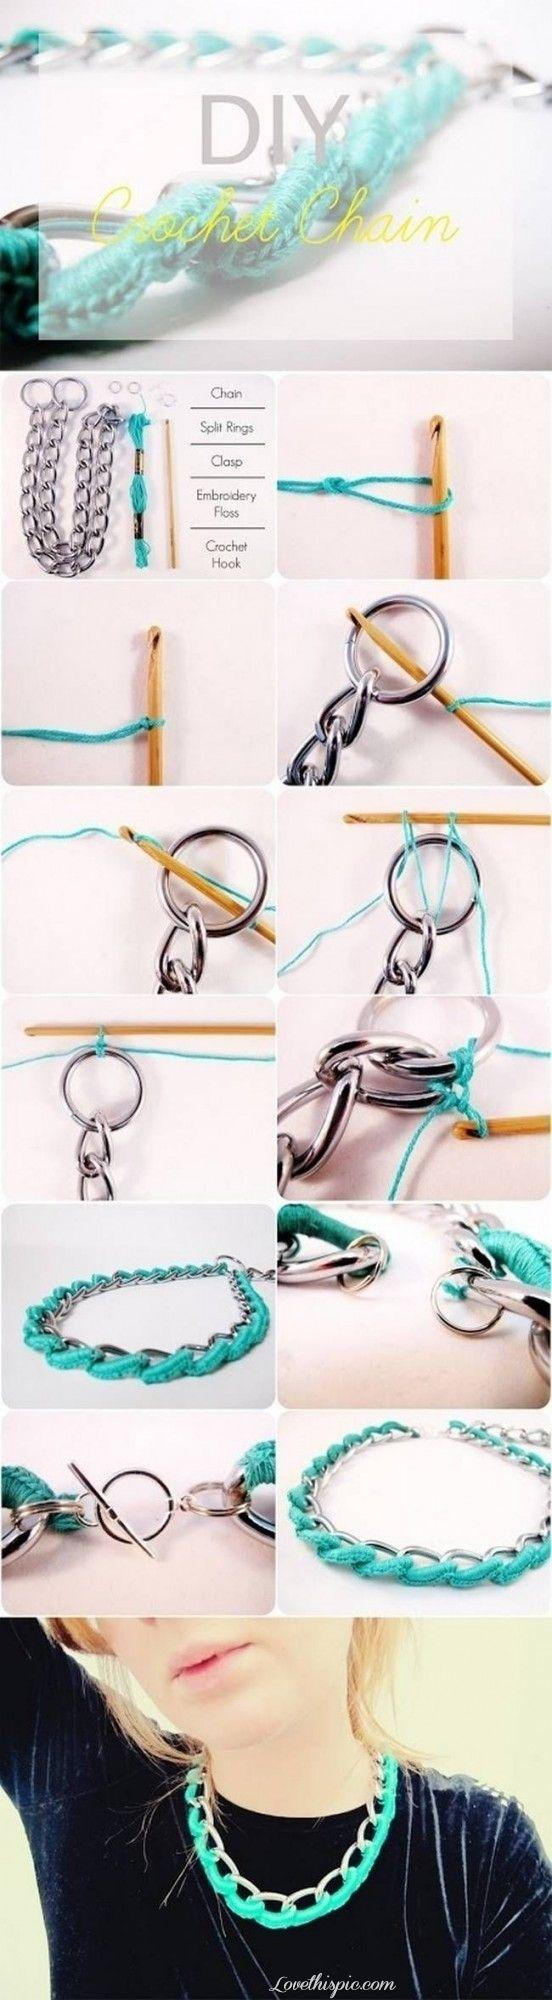 Collier chaine et crochet